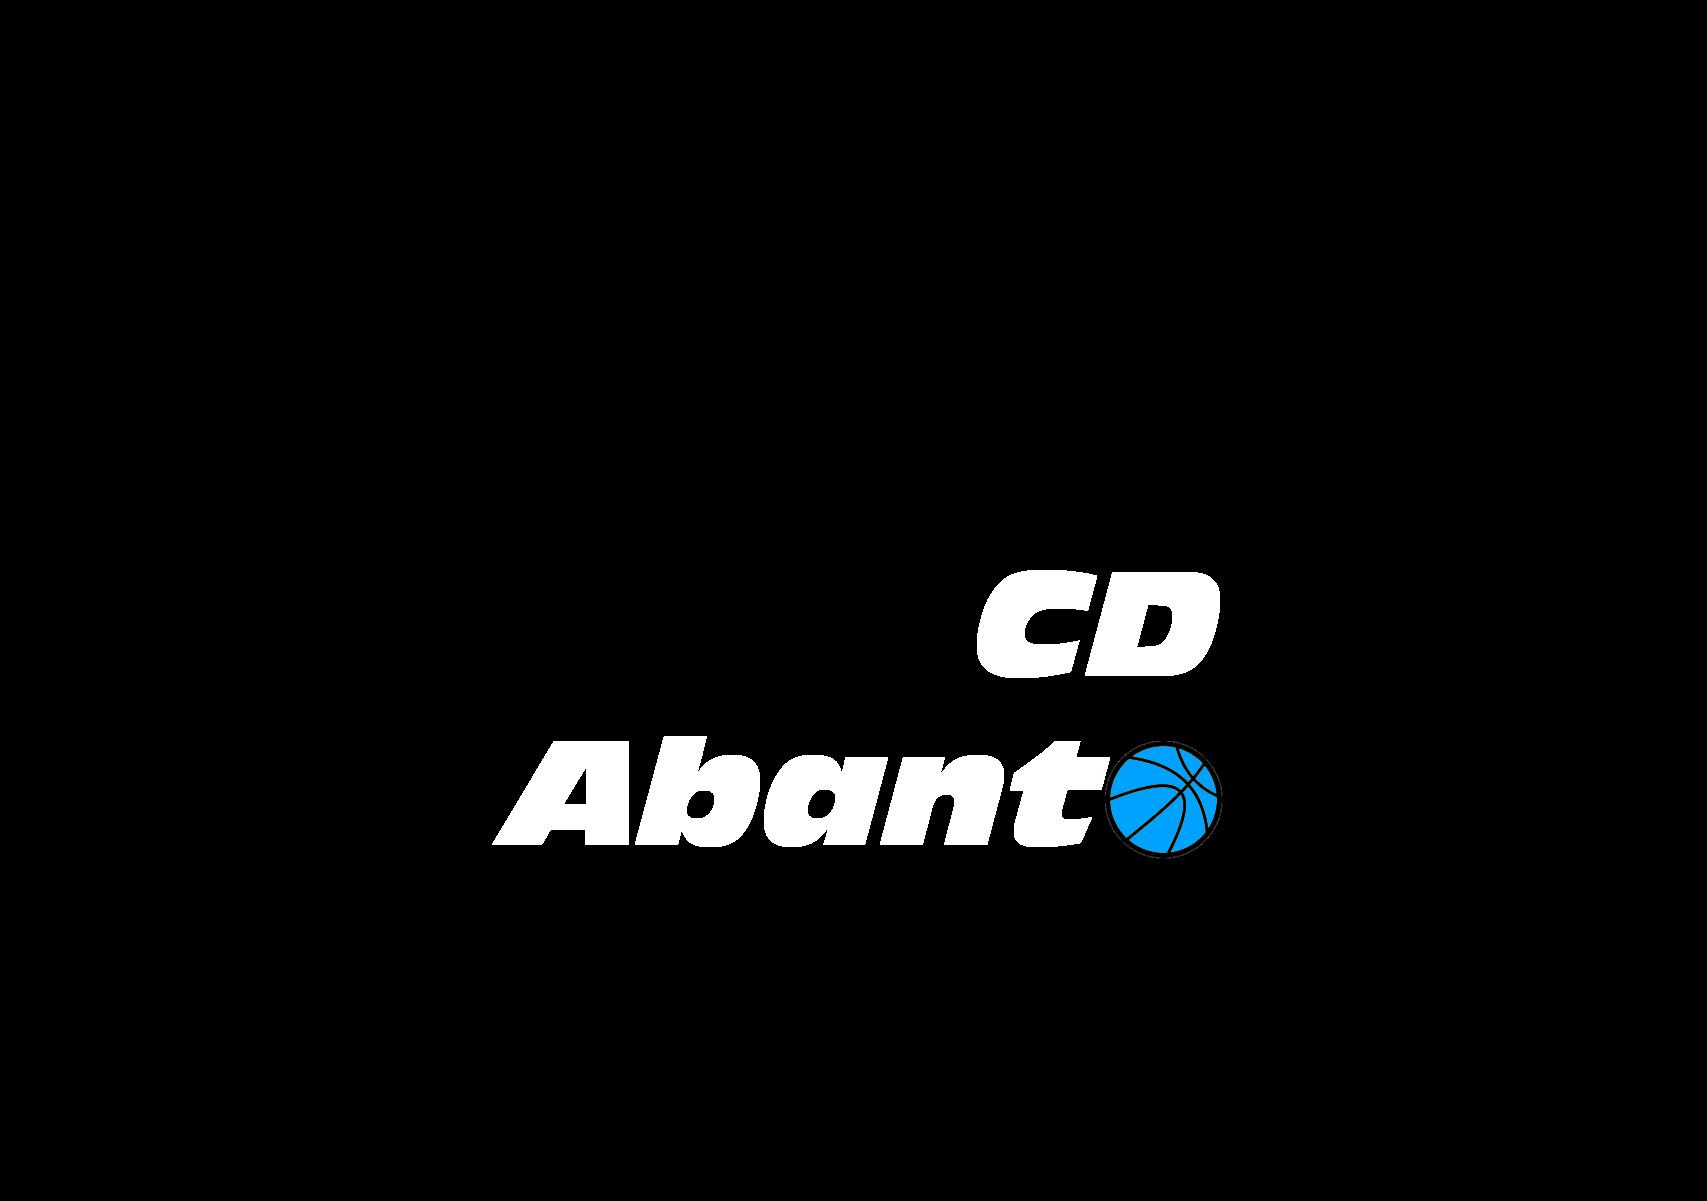 CD Abanto Baloncesto Valladolid